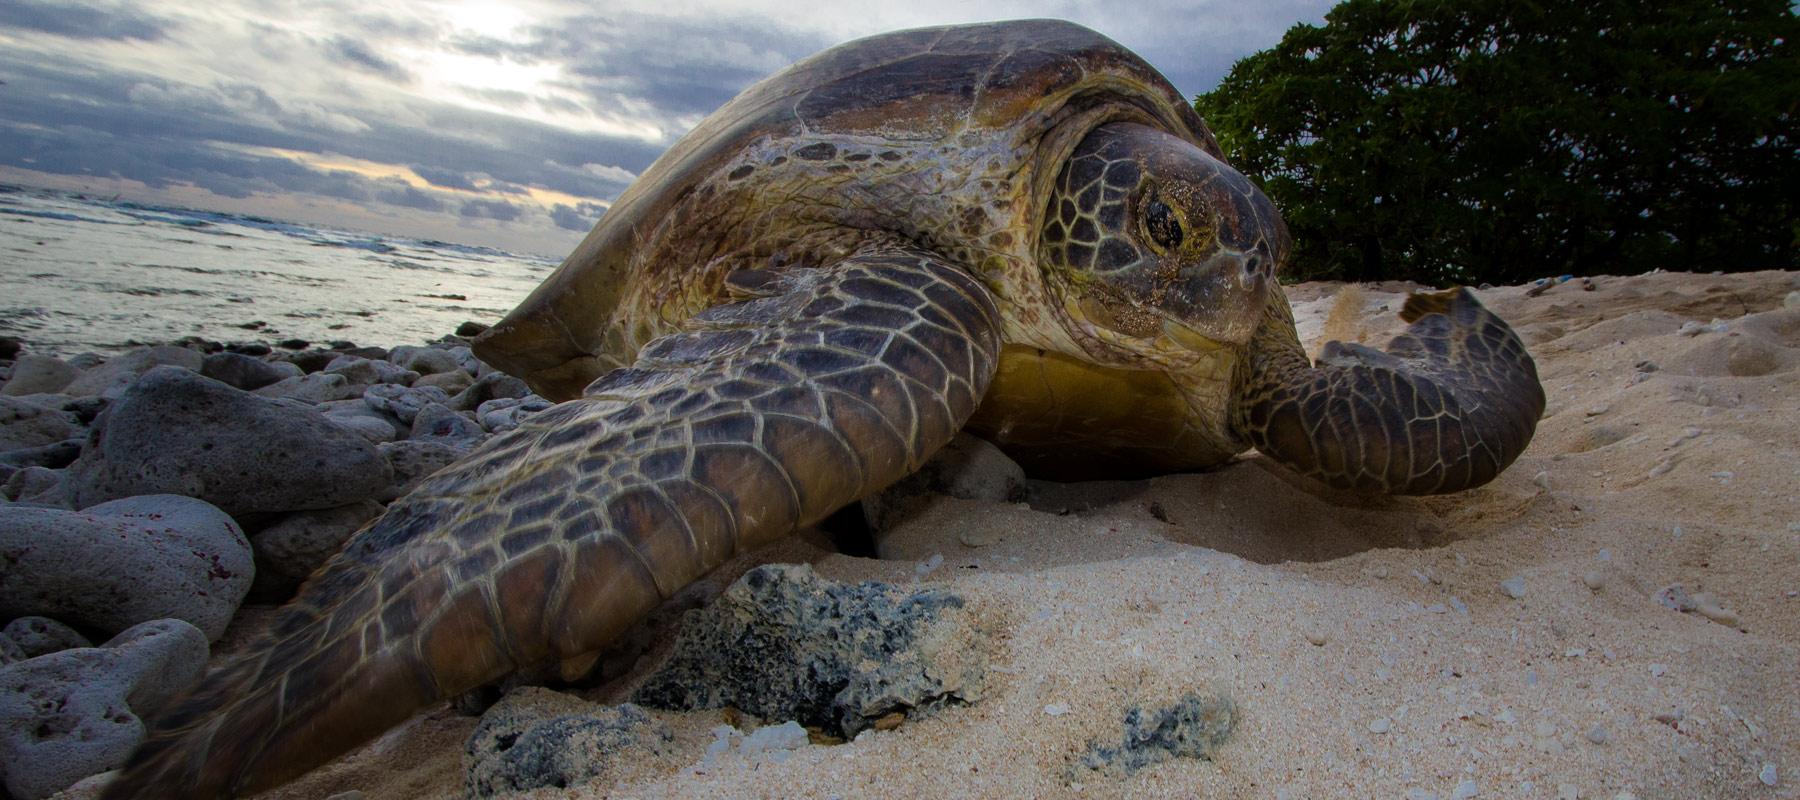 Nesting green turtle on beach